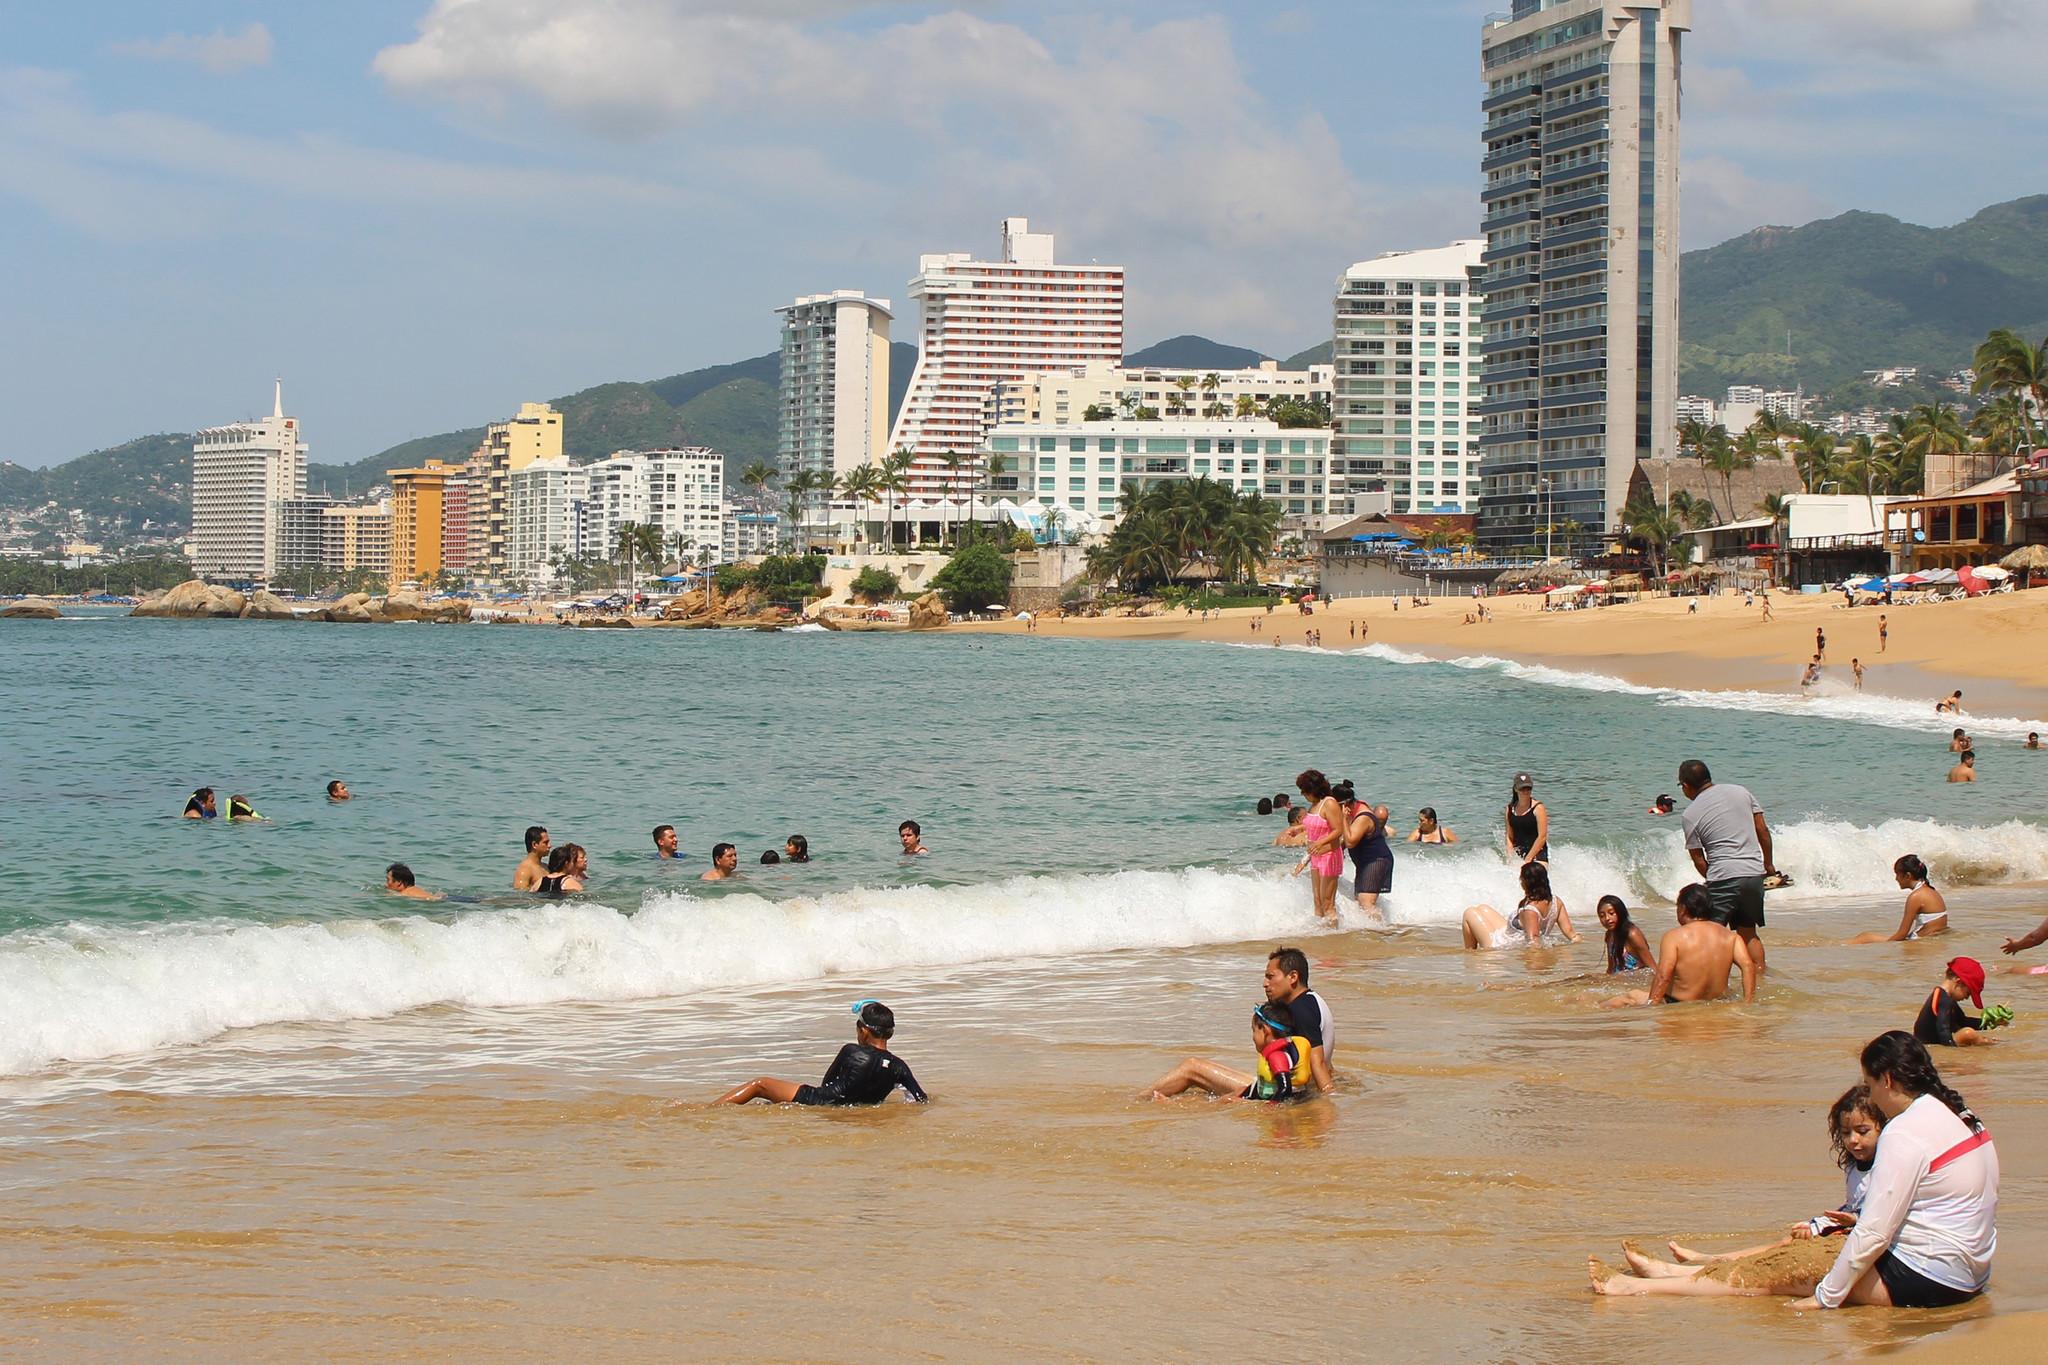 cancun still safe despite recent violence, say tourism officials